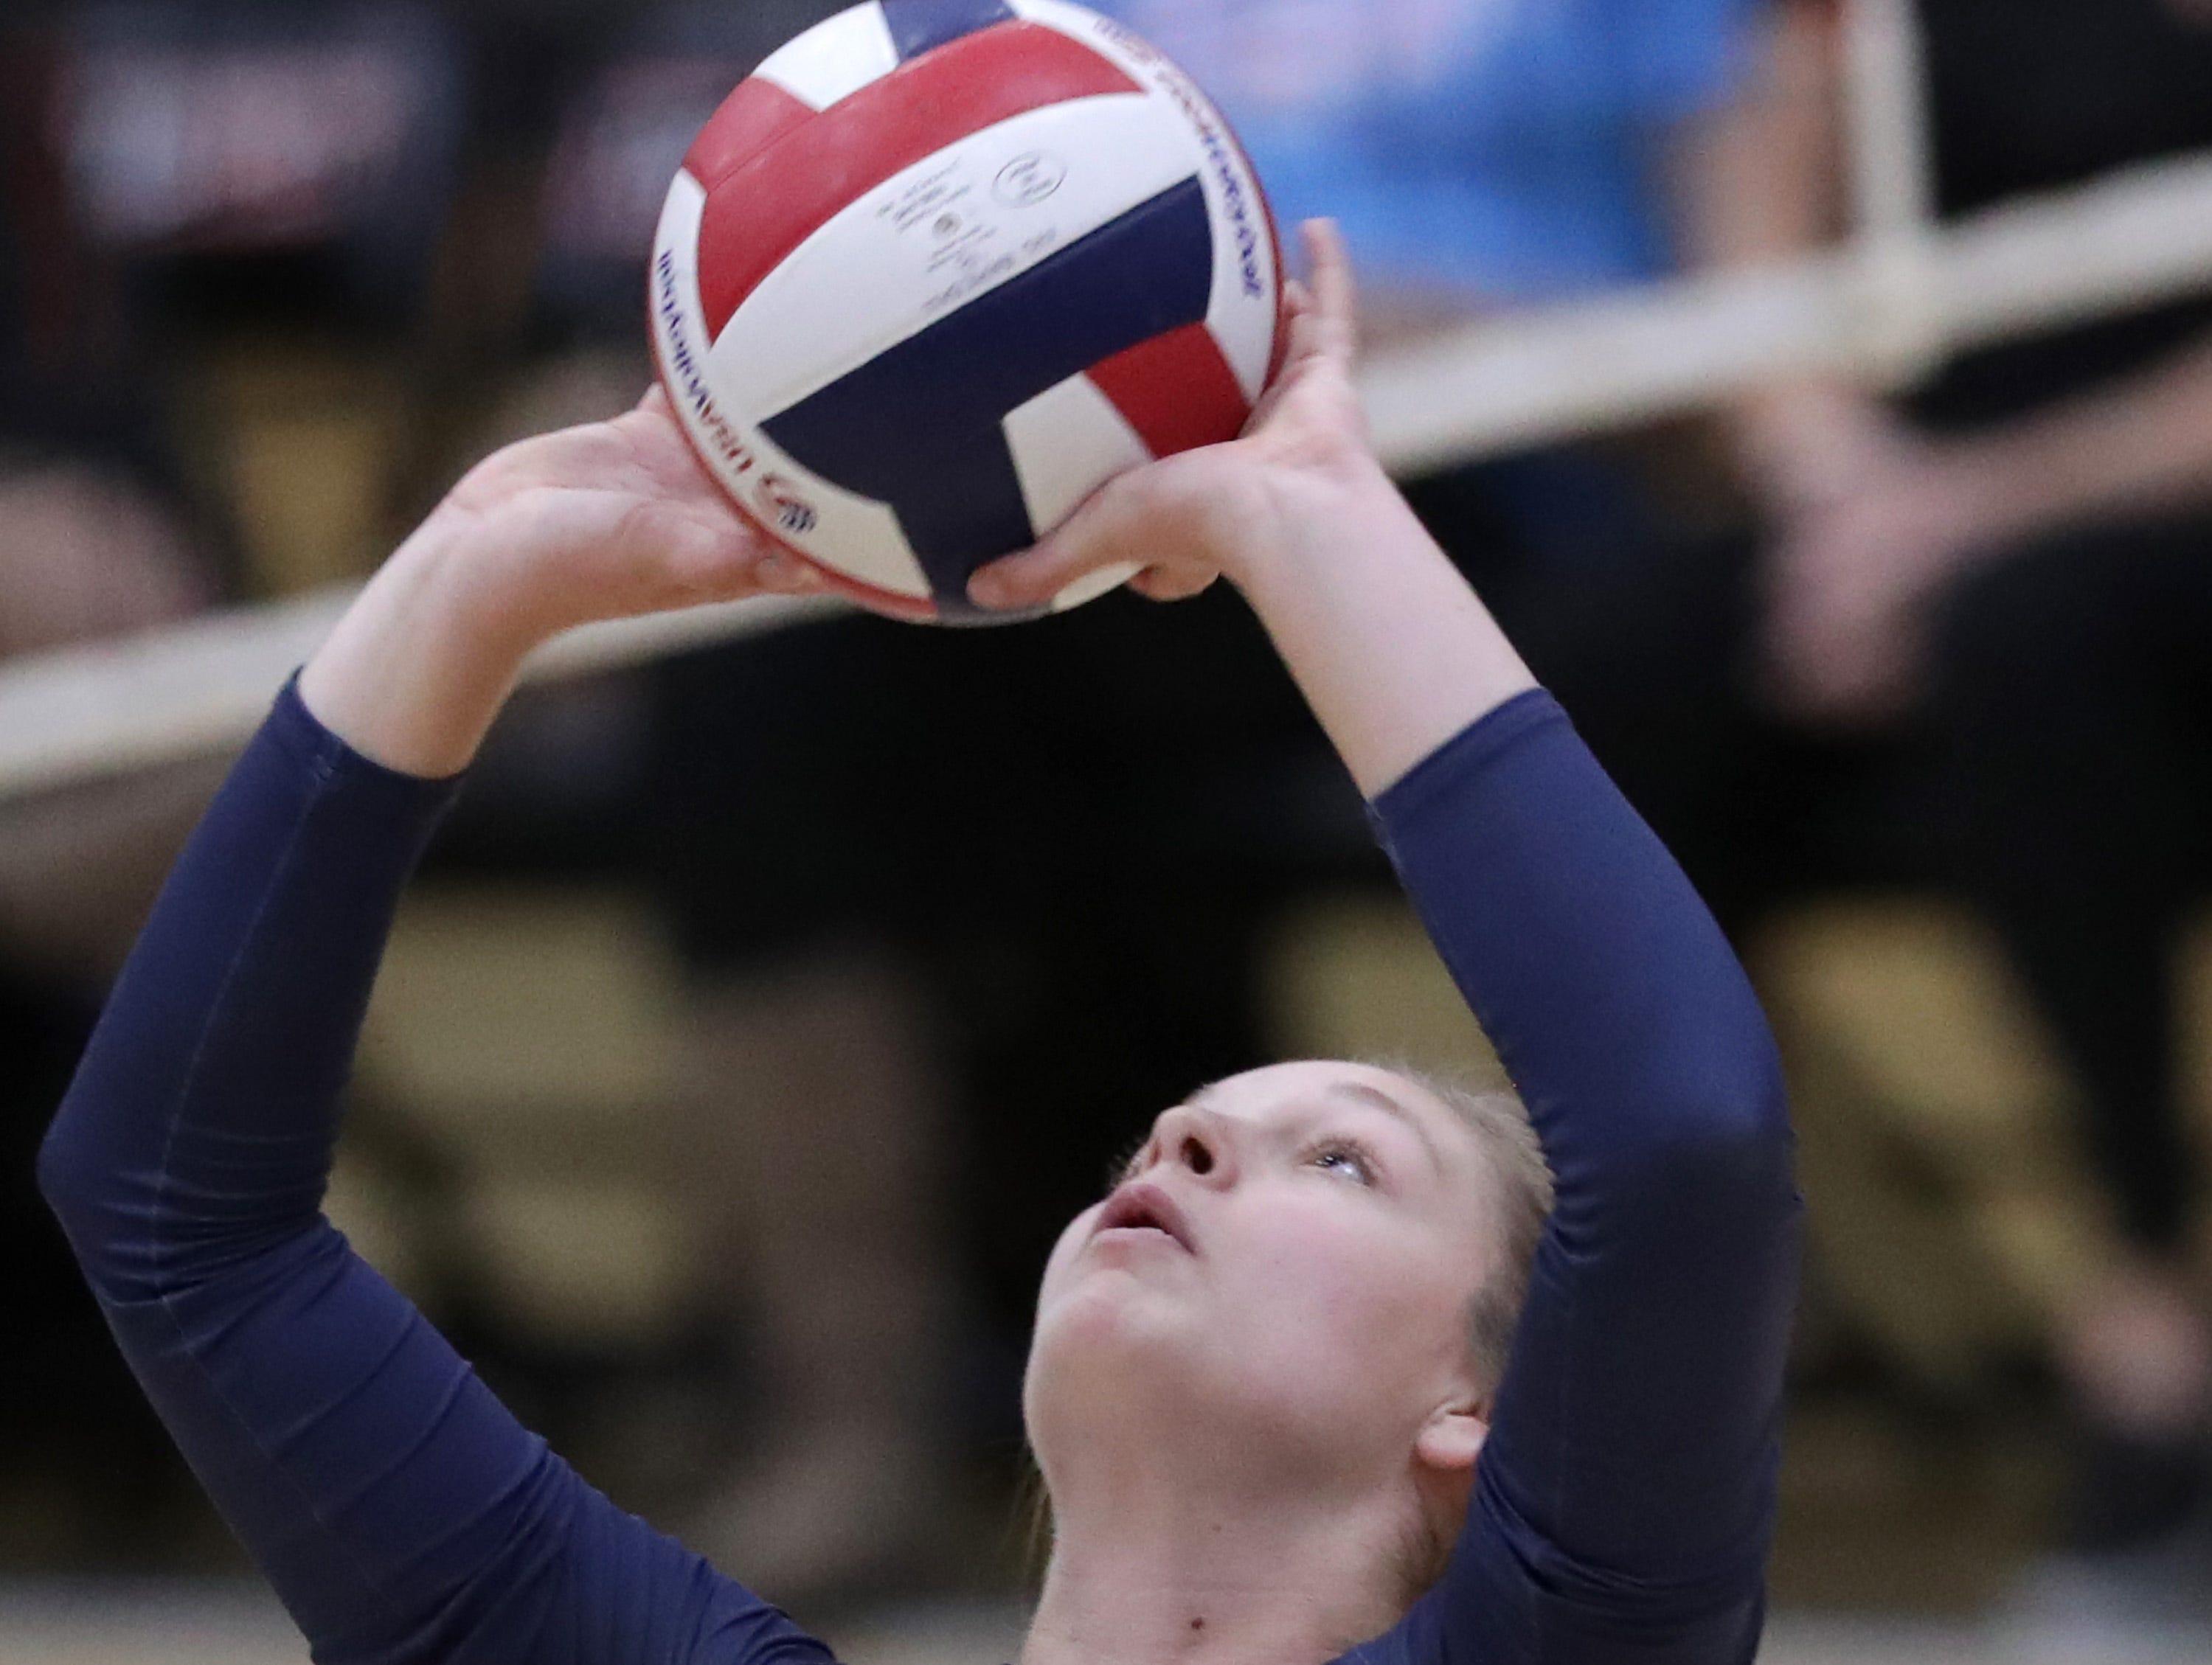 Appleton East High School's #9 Kellyn Kennedy against Kaukauna High School during their girls volleyball game on Thursday, October 11, 2018, in Kaukauna, Wis. Wm. Glasheen/USA TODAY NETWORK-Wisconsin.